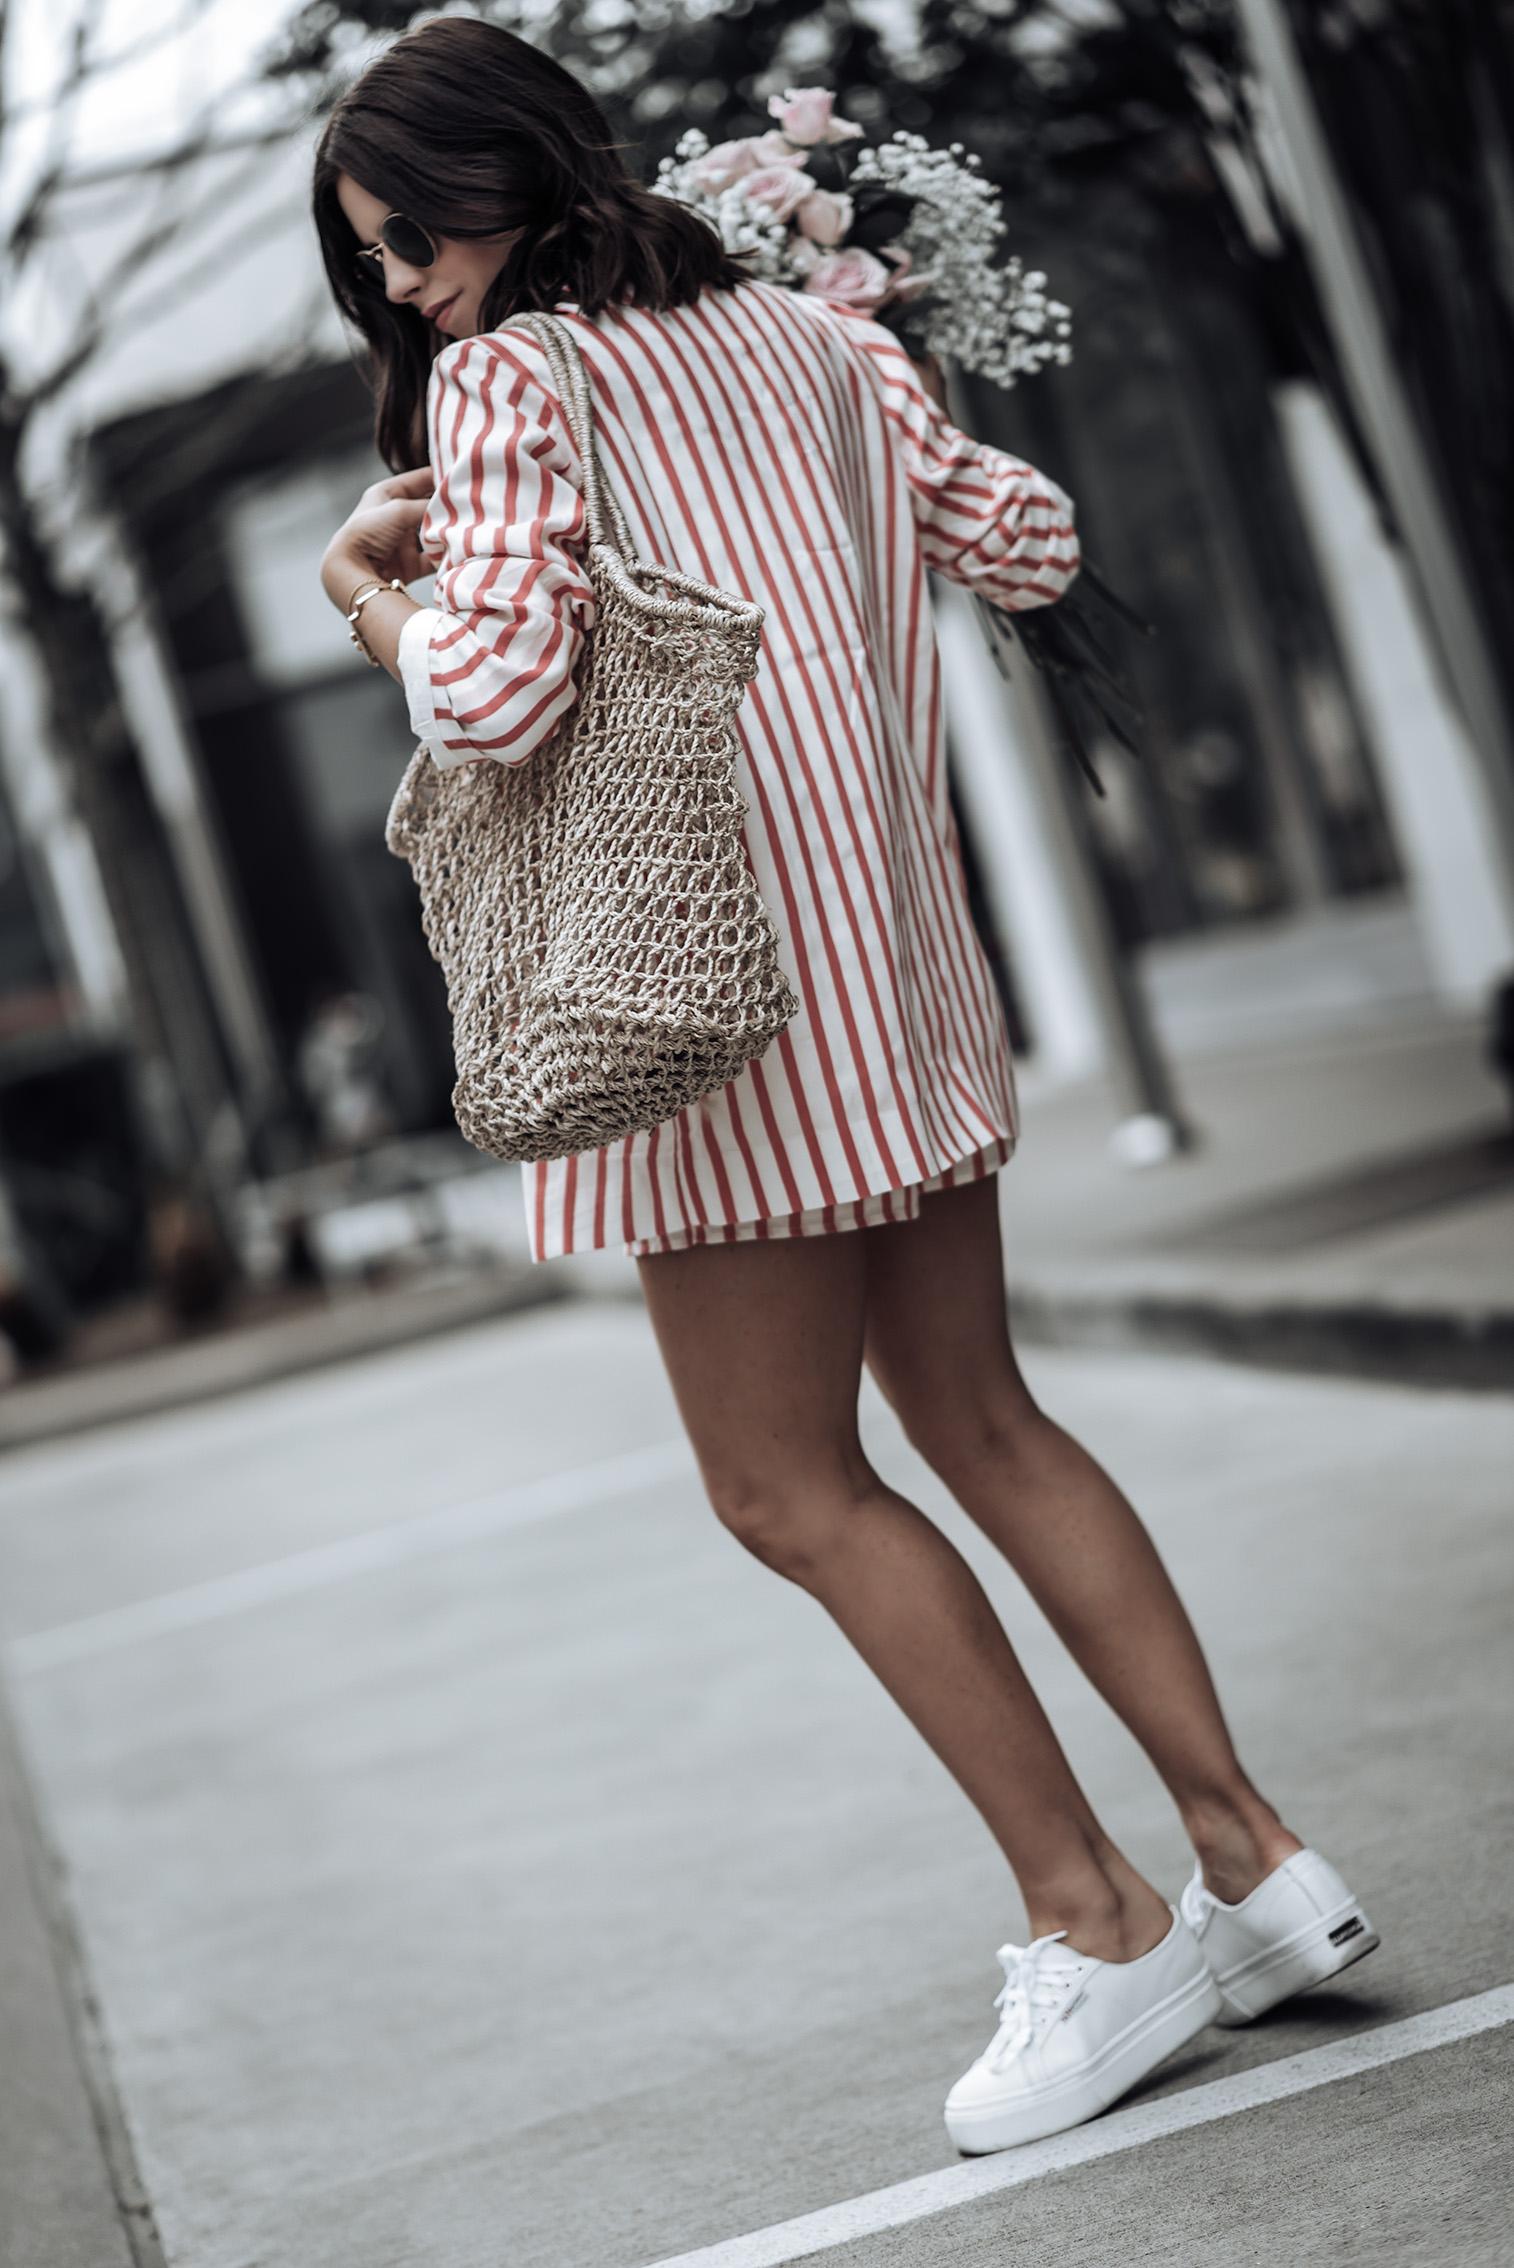 Striped Blazer set | L'Academie Adam Shorts | L'Academie Adam Blazer | Reformation bag | Superga Platform Sneakers| Bracelets: Here, & here | #liketkit #revolve #strawbag #lookbook #fashion #streetstyleblog